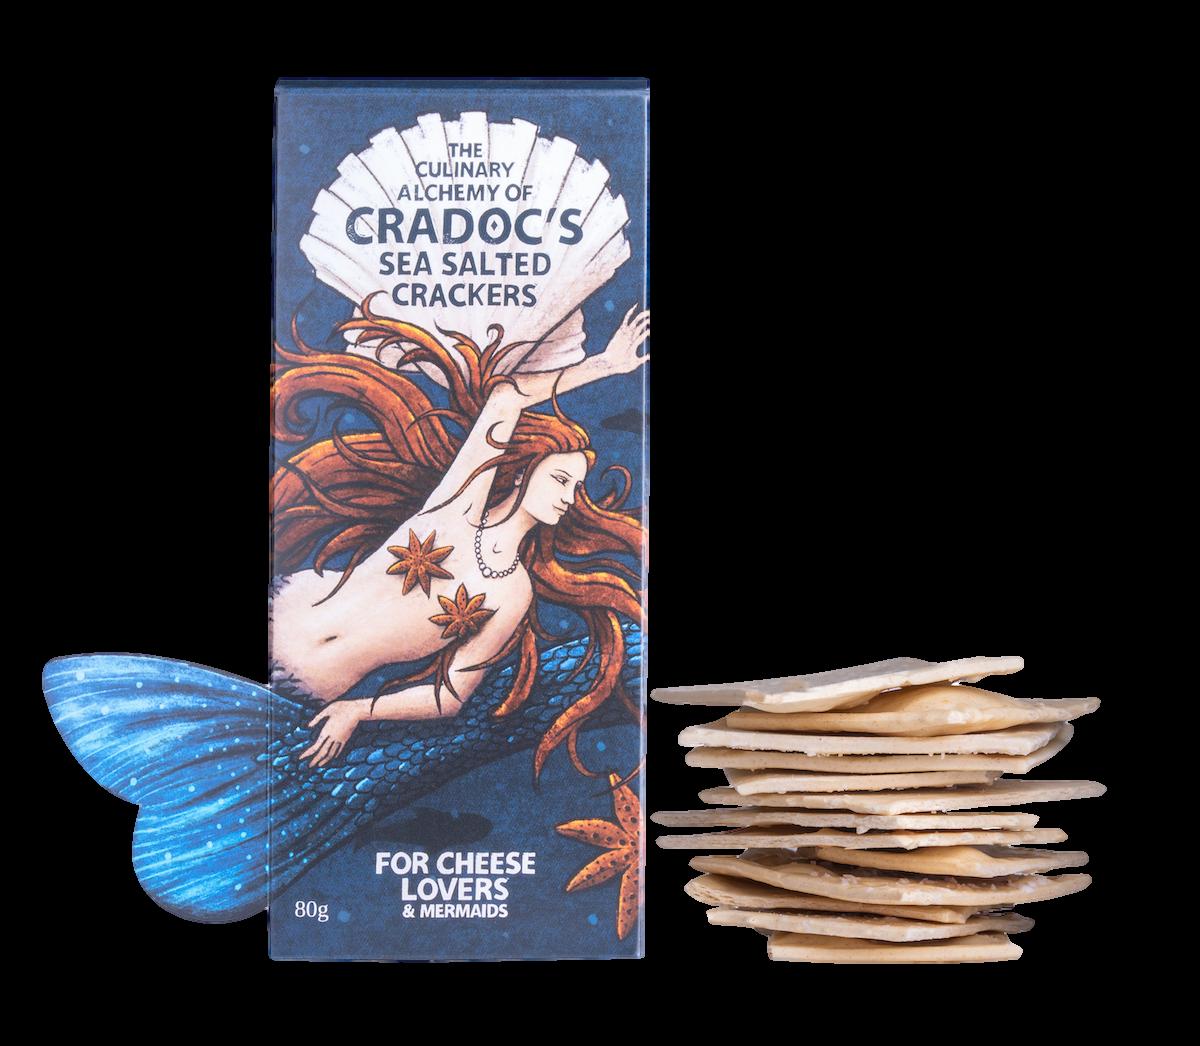 mermaid sea salted crackers _clipped_rev_1 (2)